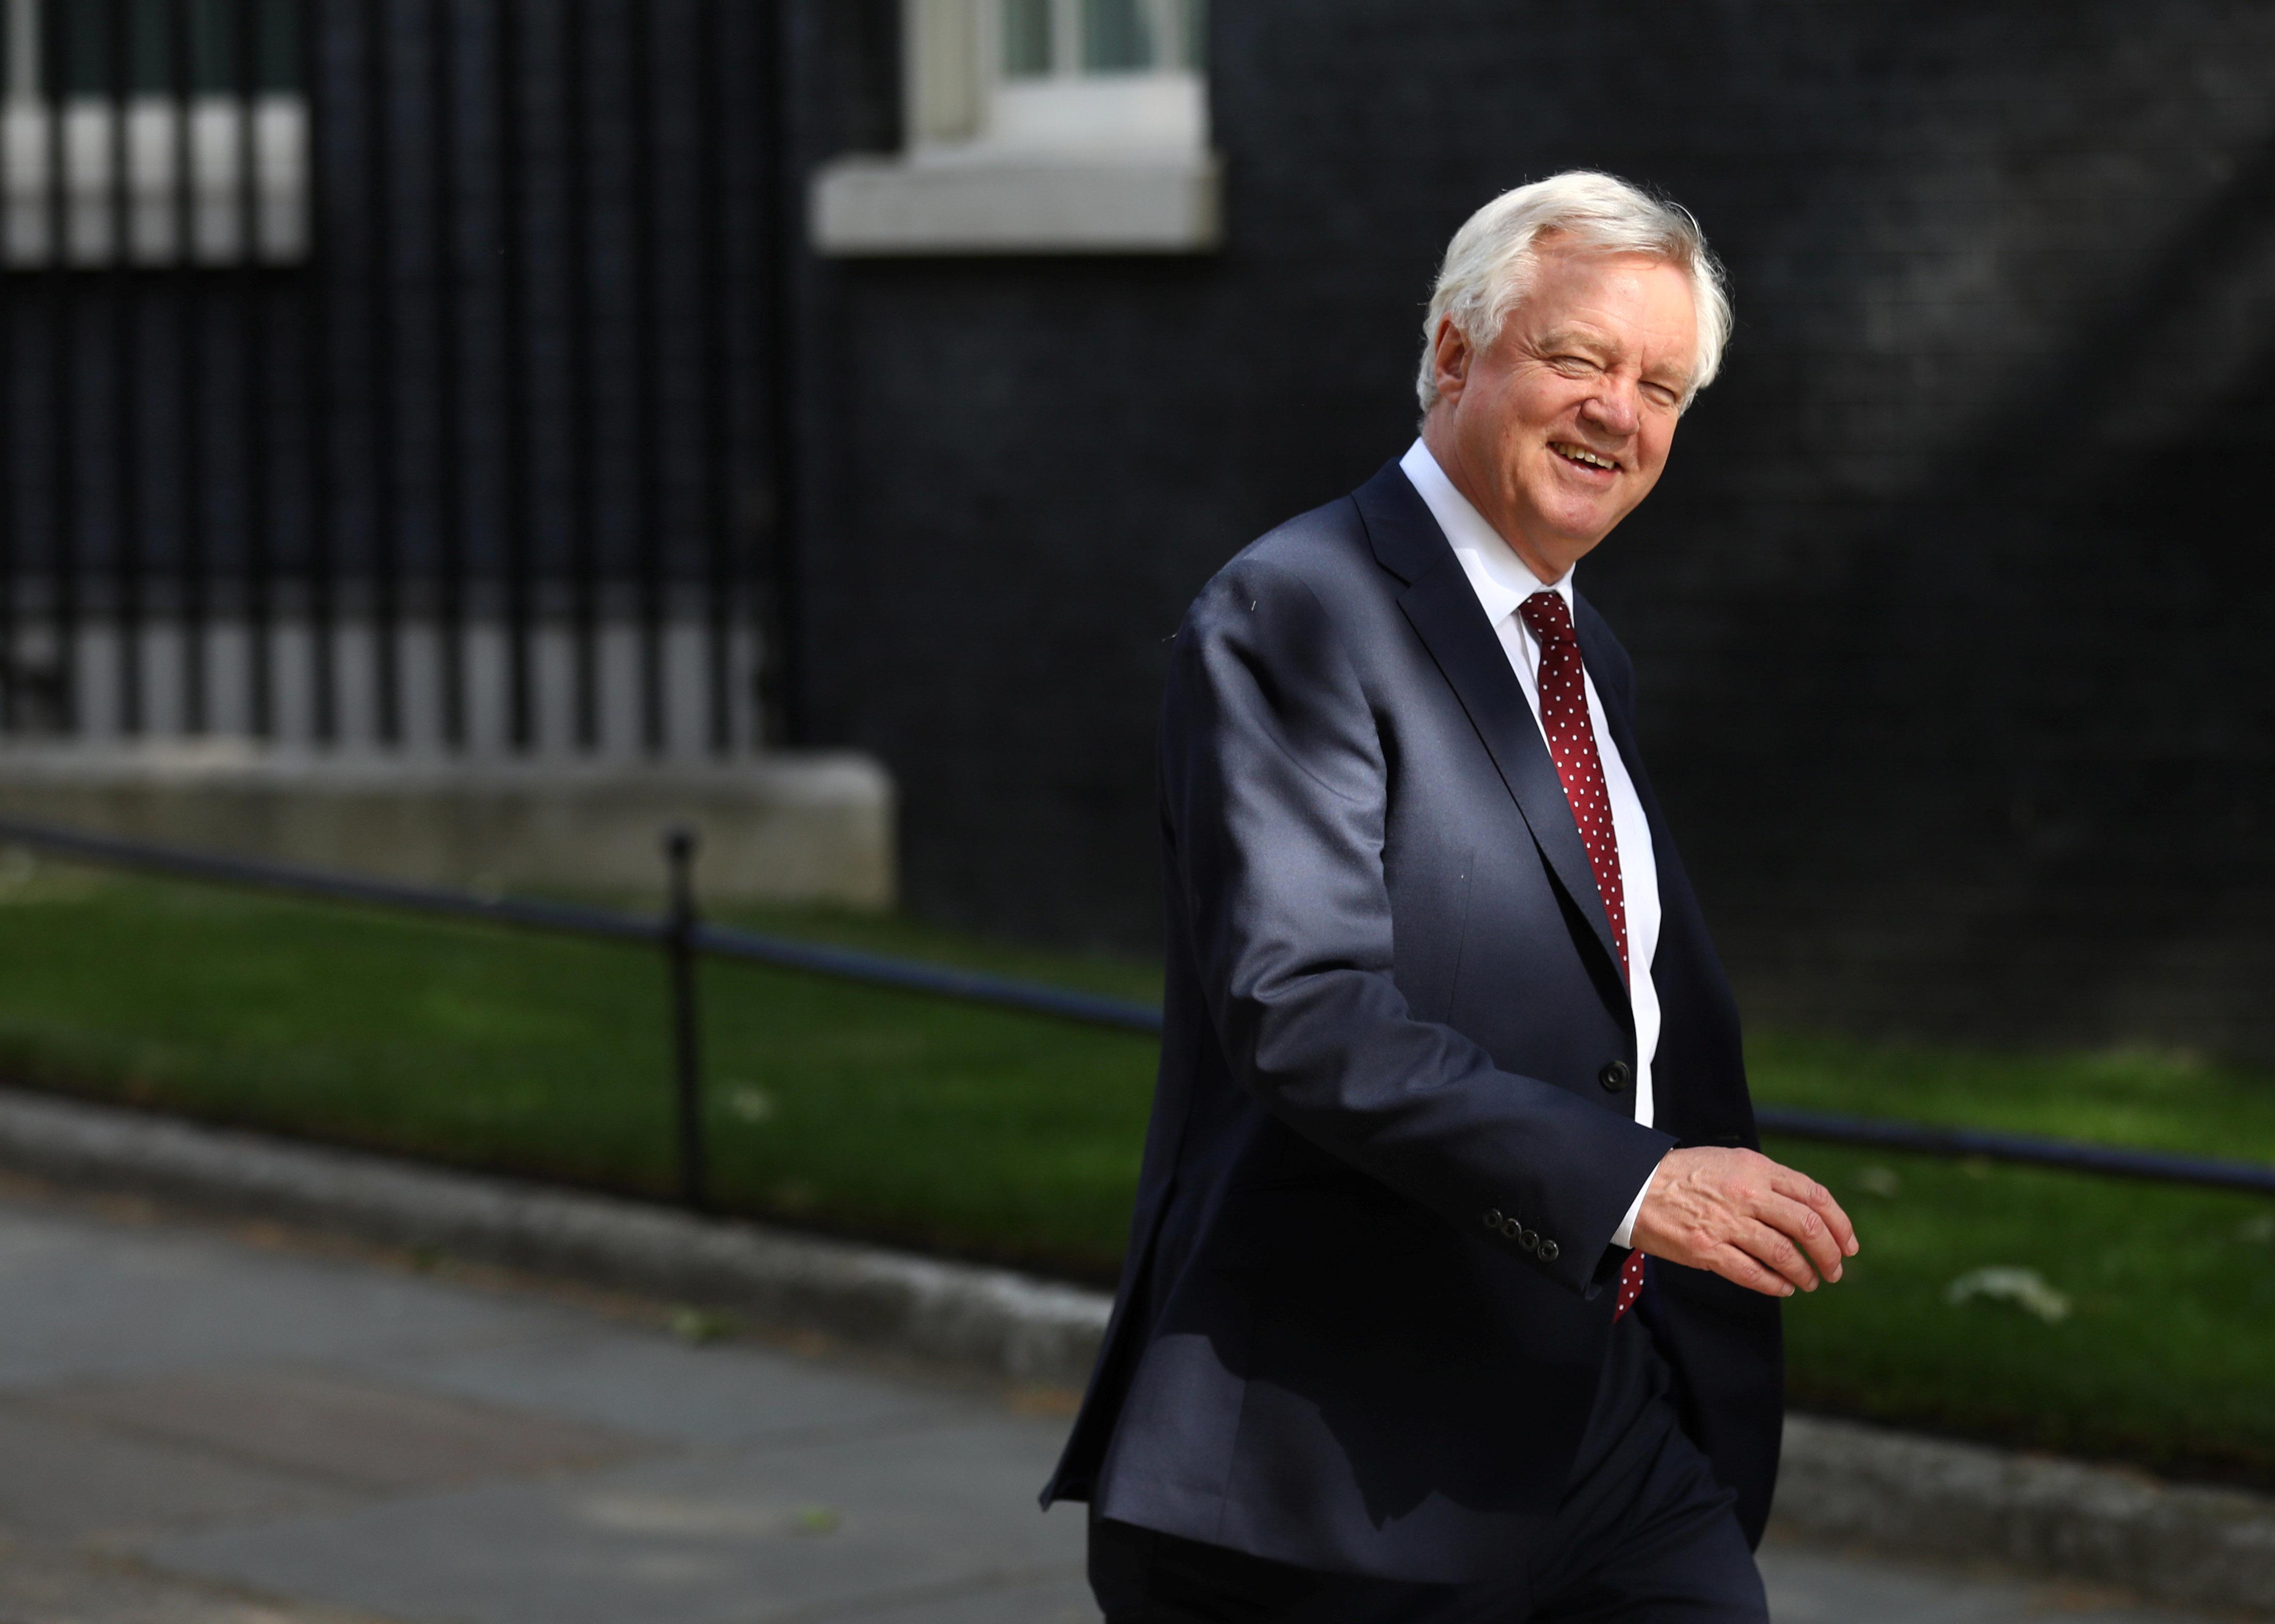 Britain's Secretary of State for Exiting the European Union David Davis walks down Downing Street in London, Britain, July 4, 2018. REUTERS/Simon Dawson